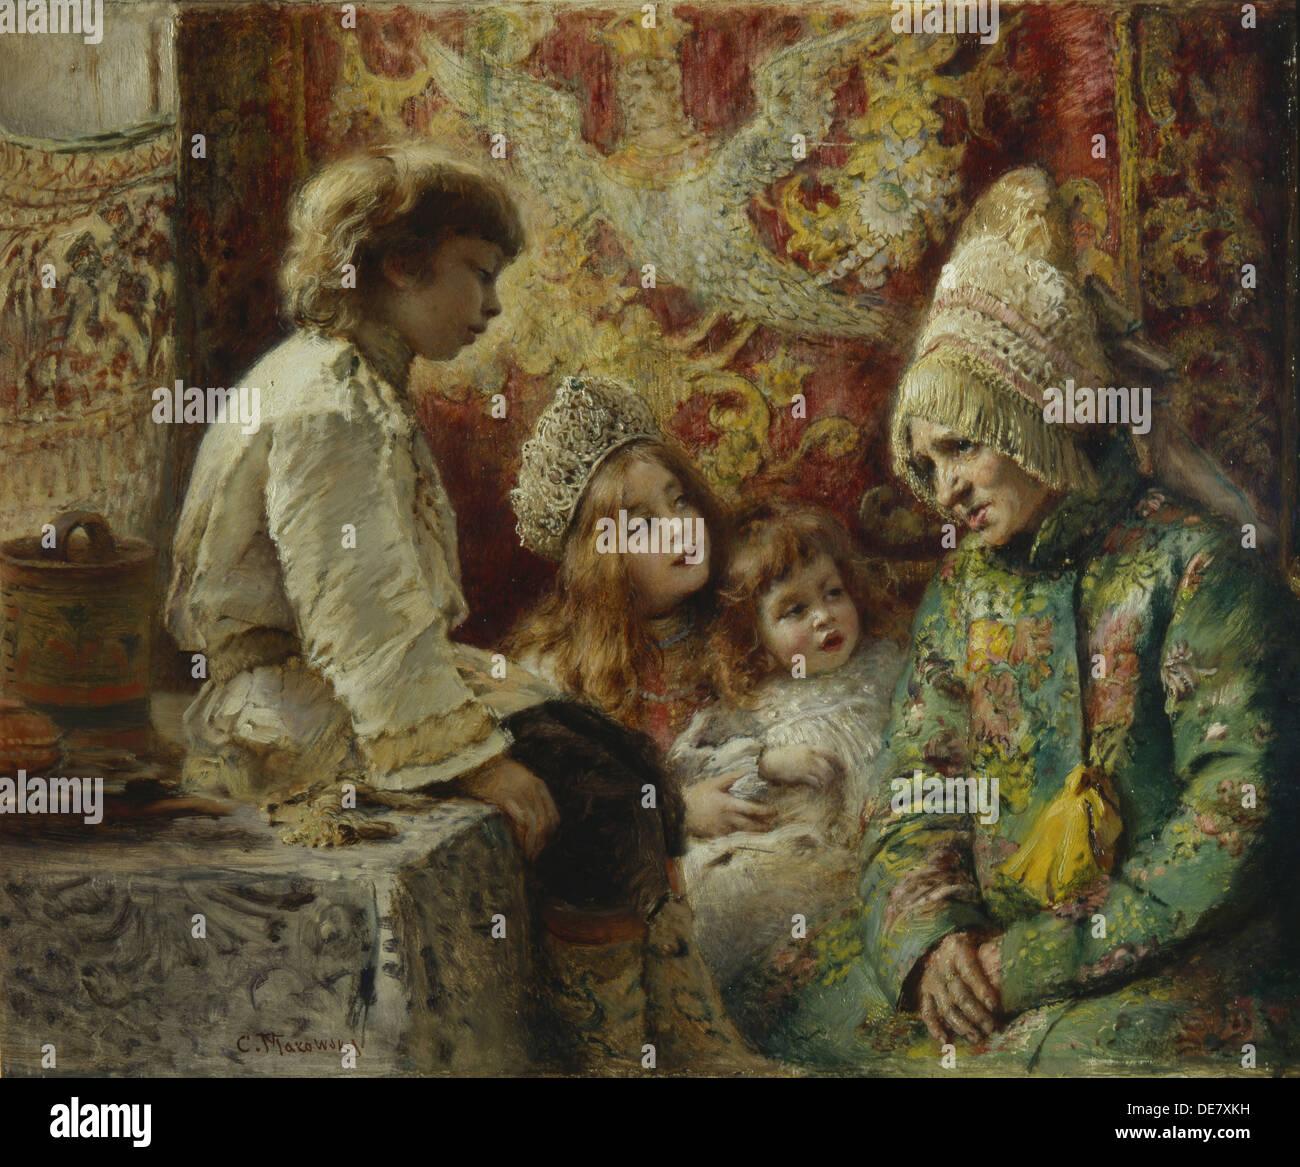 Grandma with Kids (Grandmother's Fairy Tale), 1882. Artist: Makovsky, Konstantin Yegorovich (1839-1915) - Stock Image